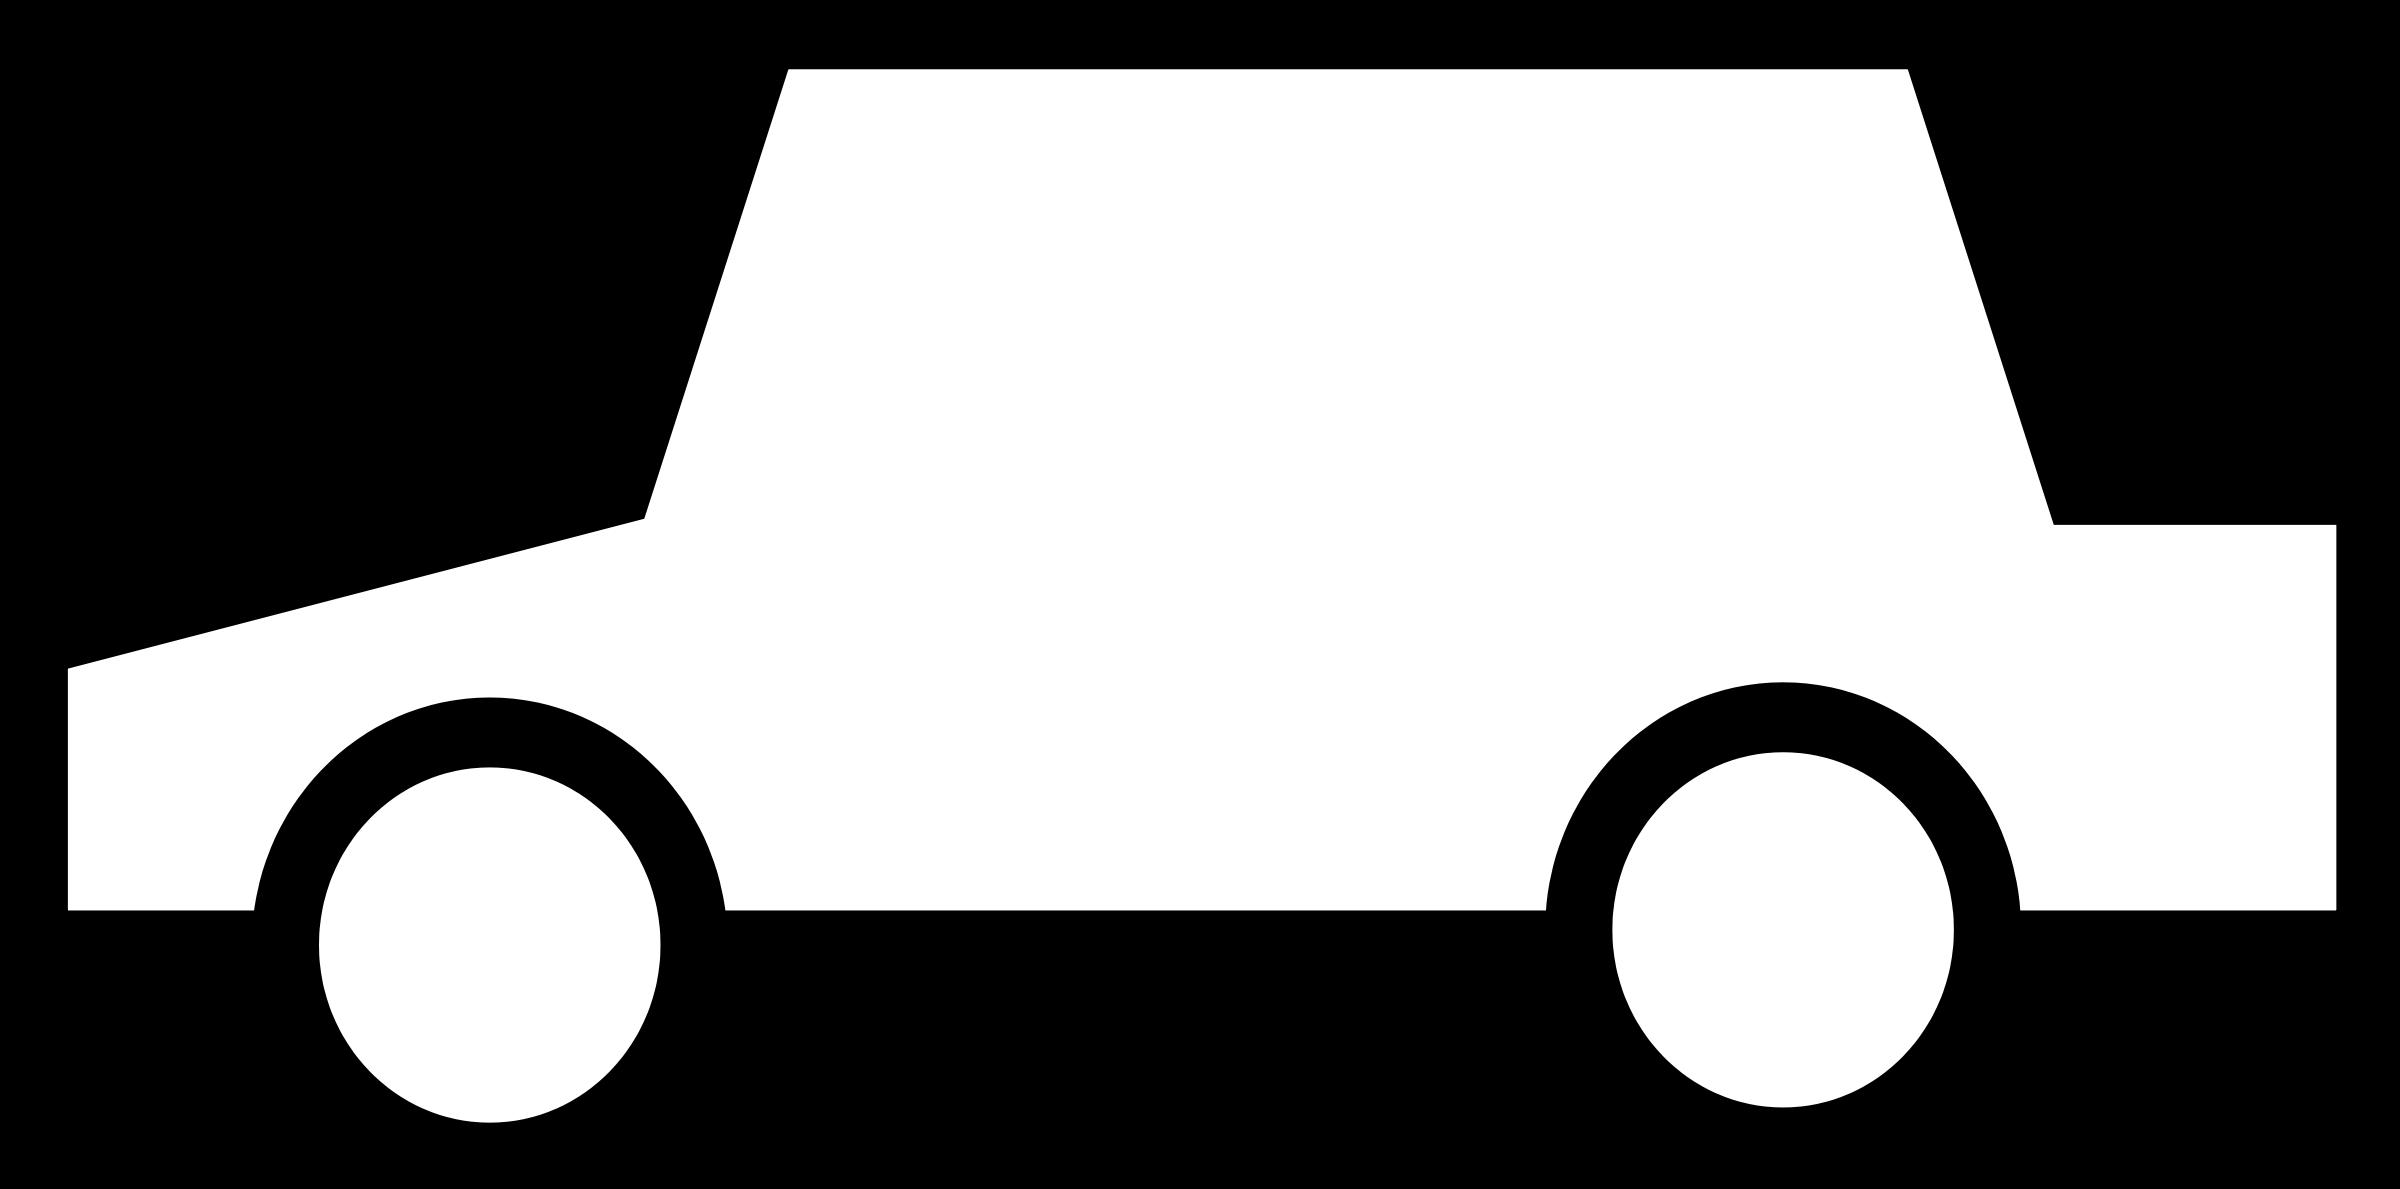 Car Side View Clipart - Clipart Kid